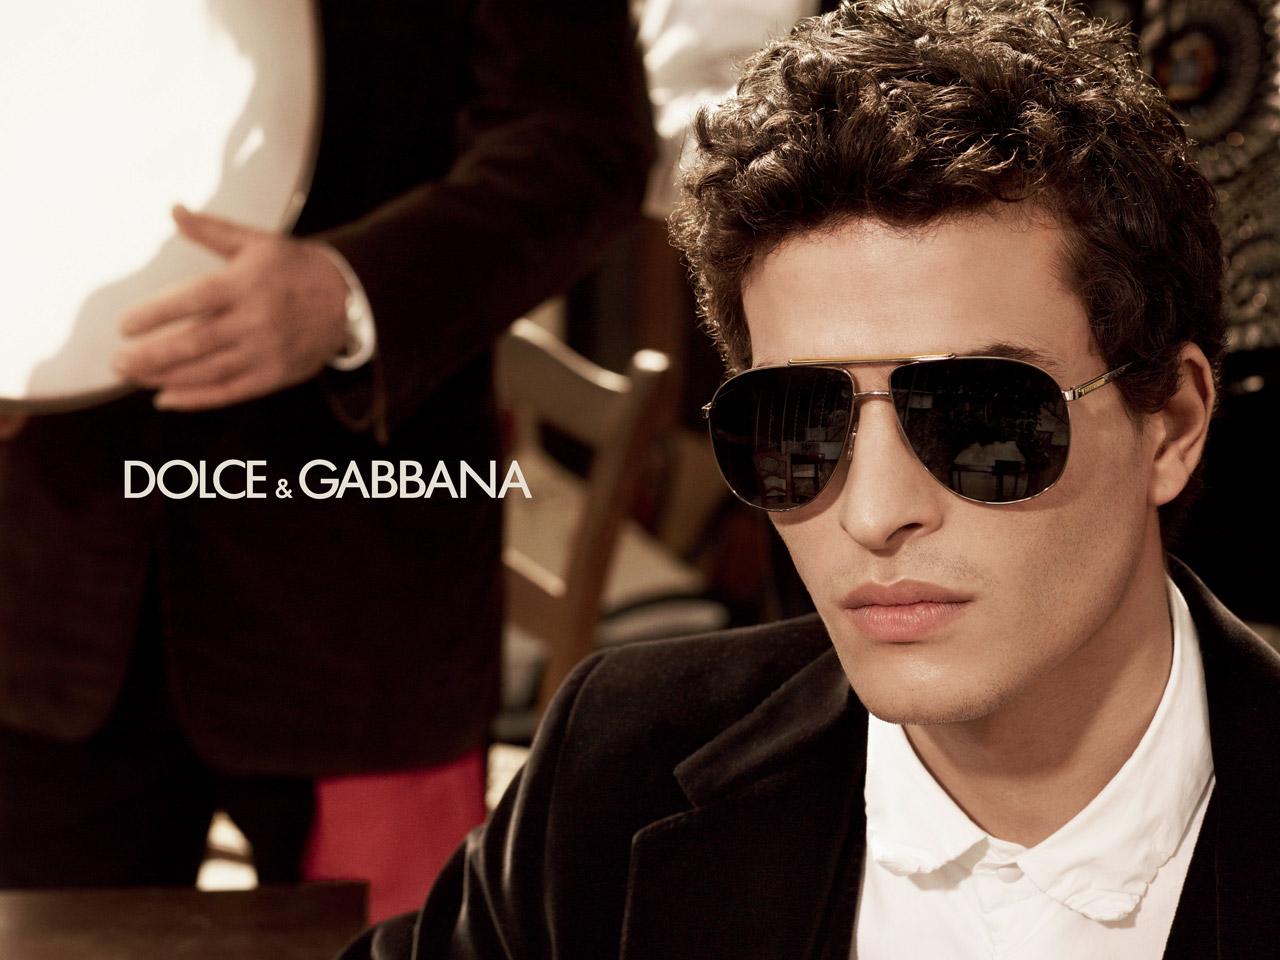 2db320acb6 1280x960dolce-gabbana-adv-sunglasses-campaign-fw-2013-men-g.jpg